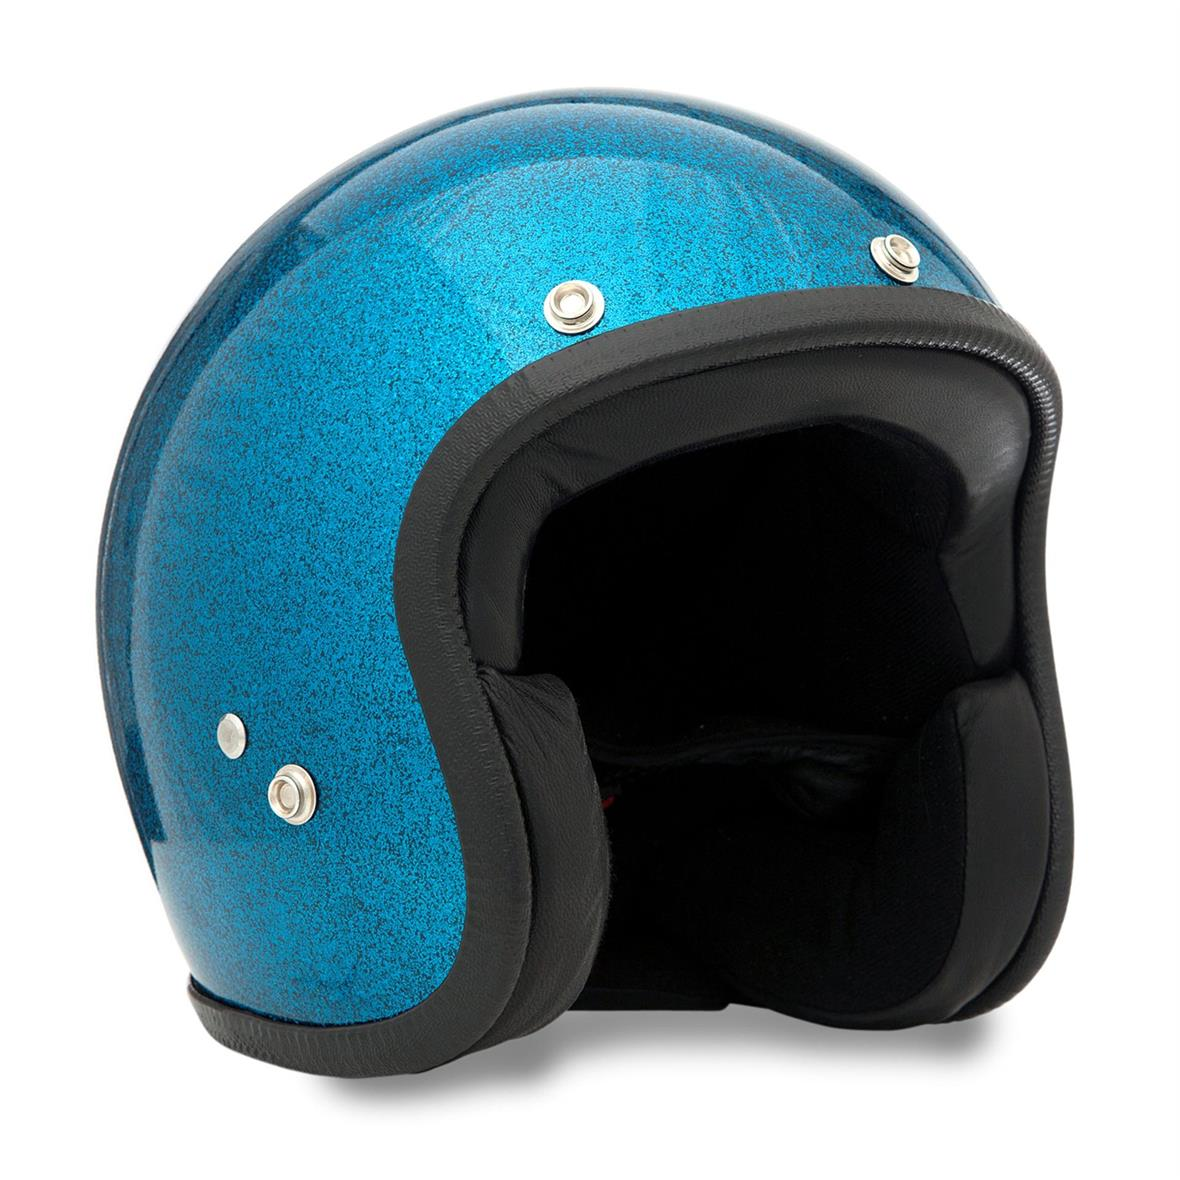 "Product Image for 'Helmet 70'S HELMETS ""METAL FLAKES""Title'"